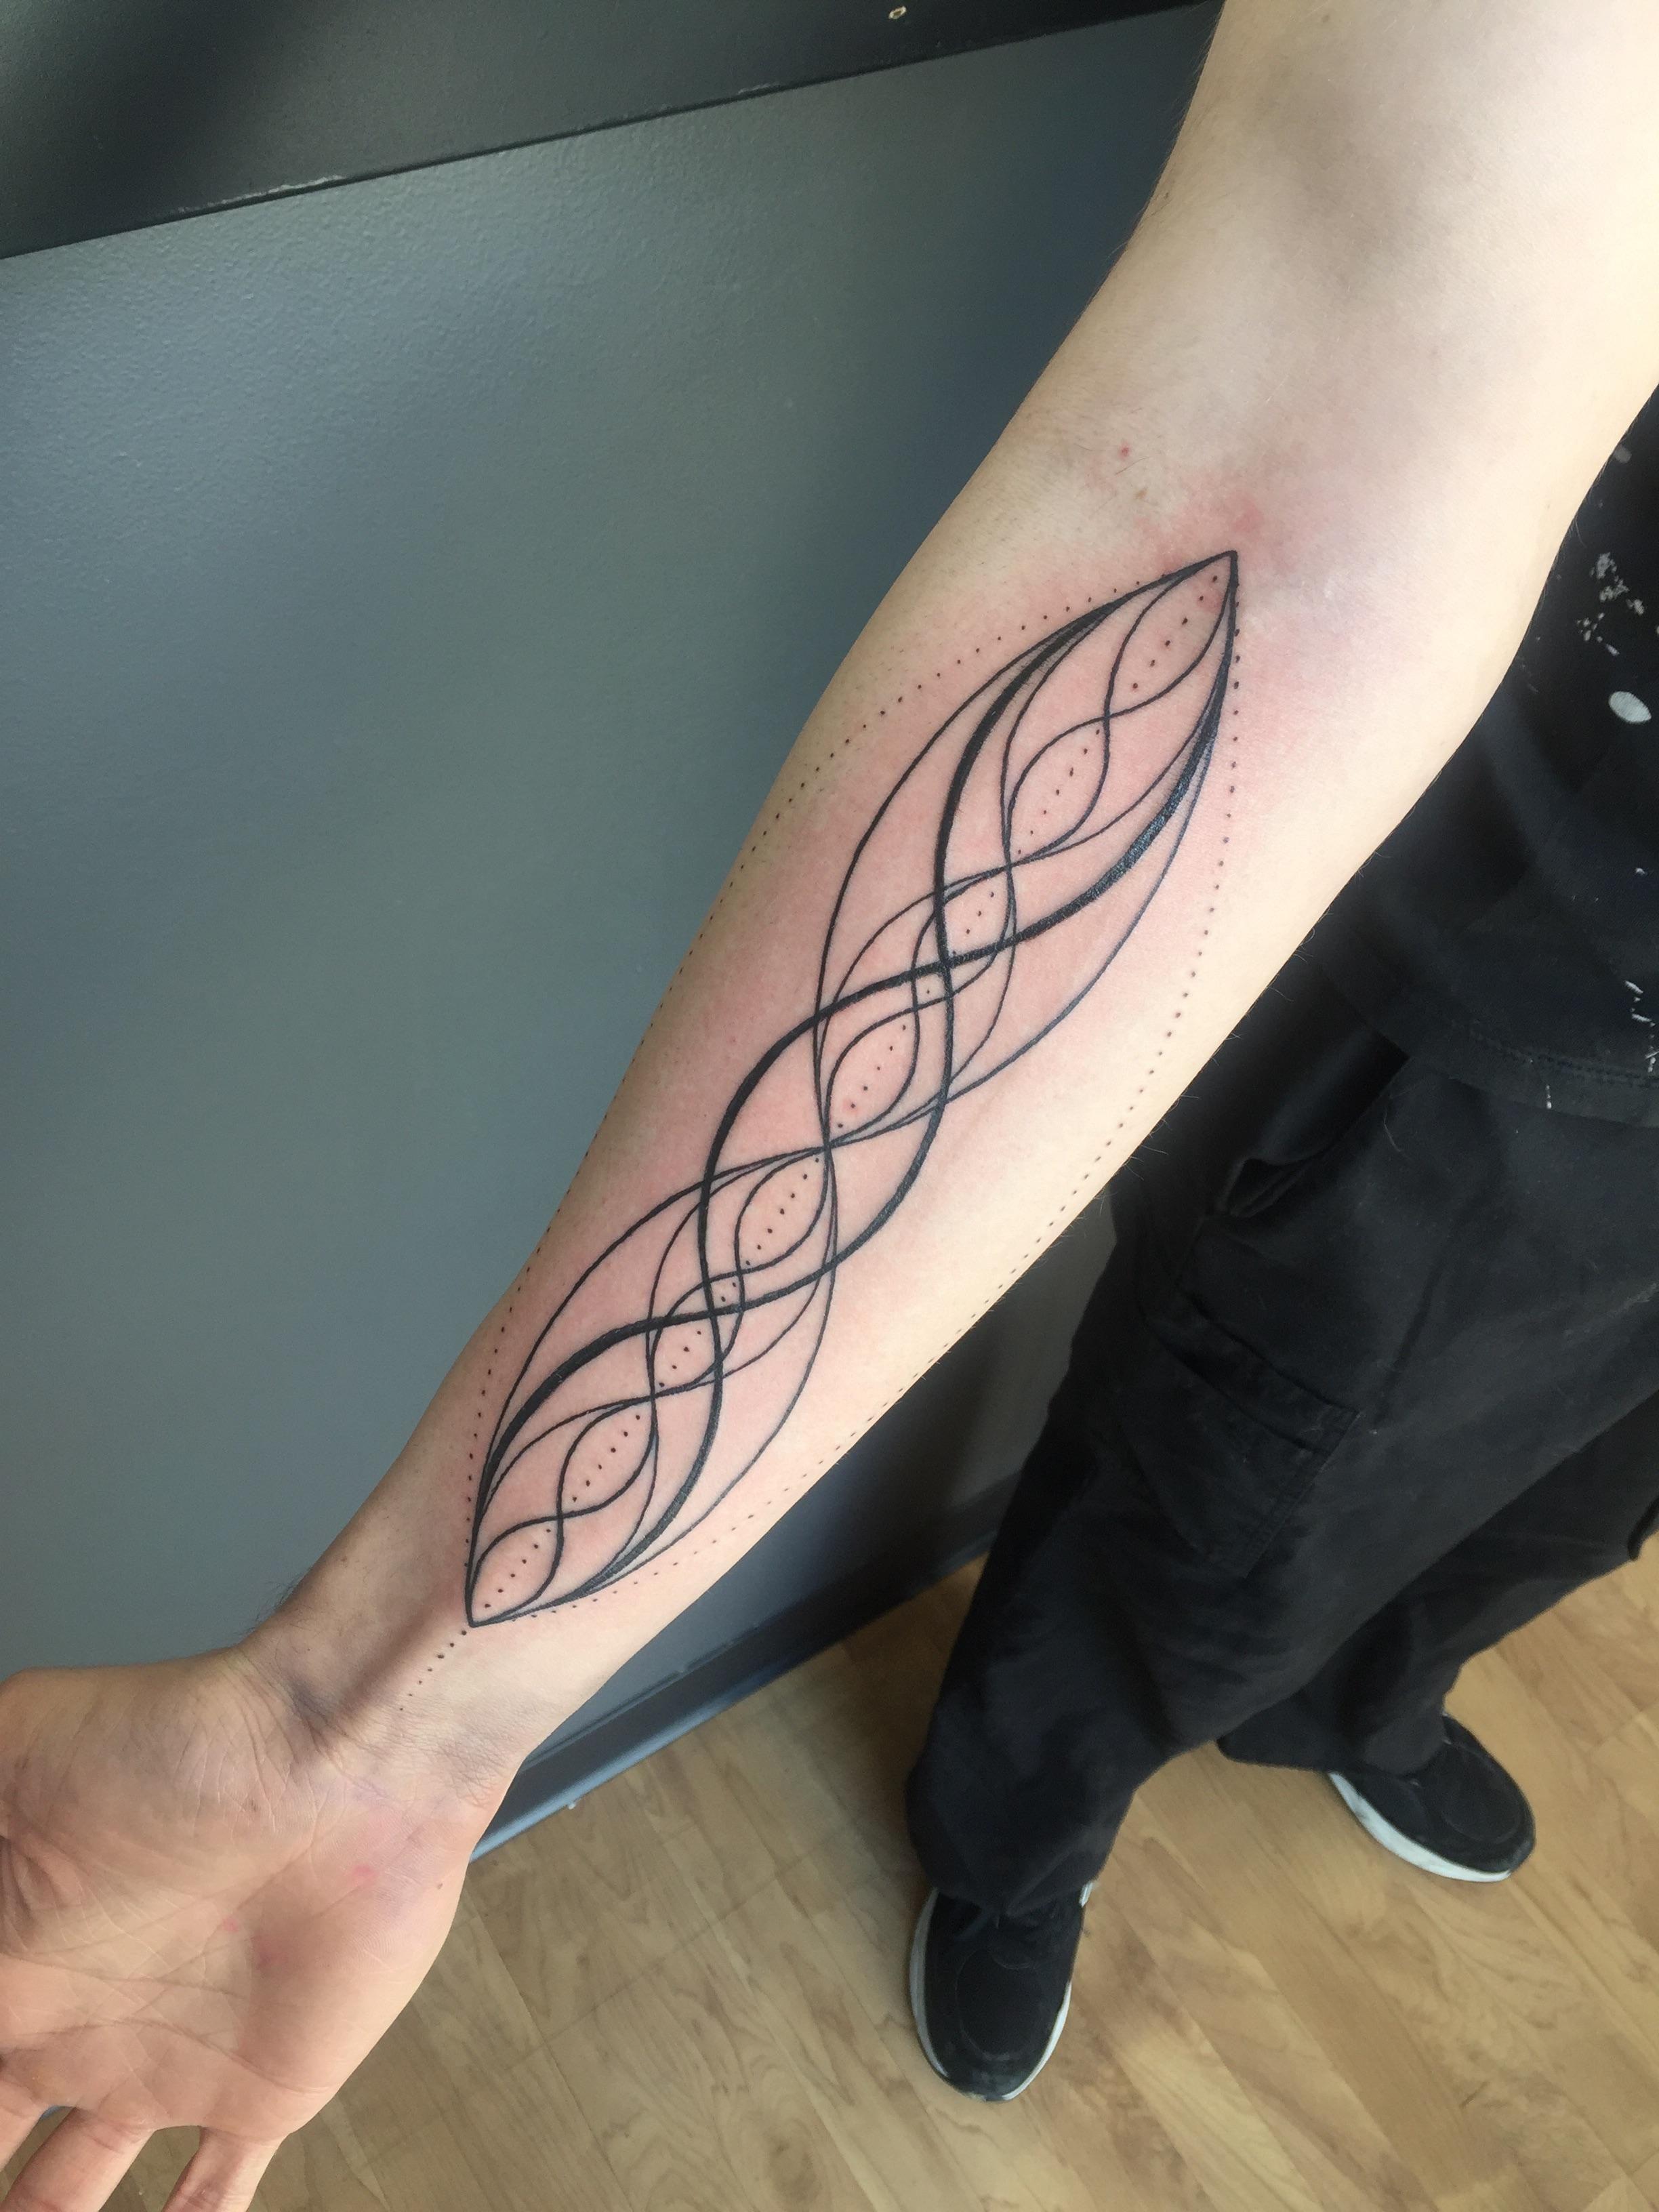 The Harmonic Series done by Annelisa Ochoa at 27 tattoo in Salt Lake City, Utah.